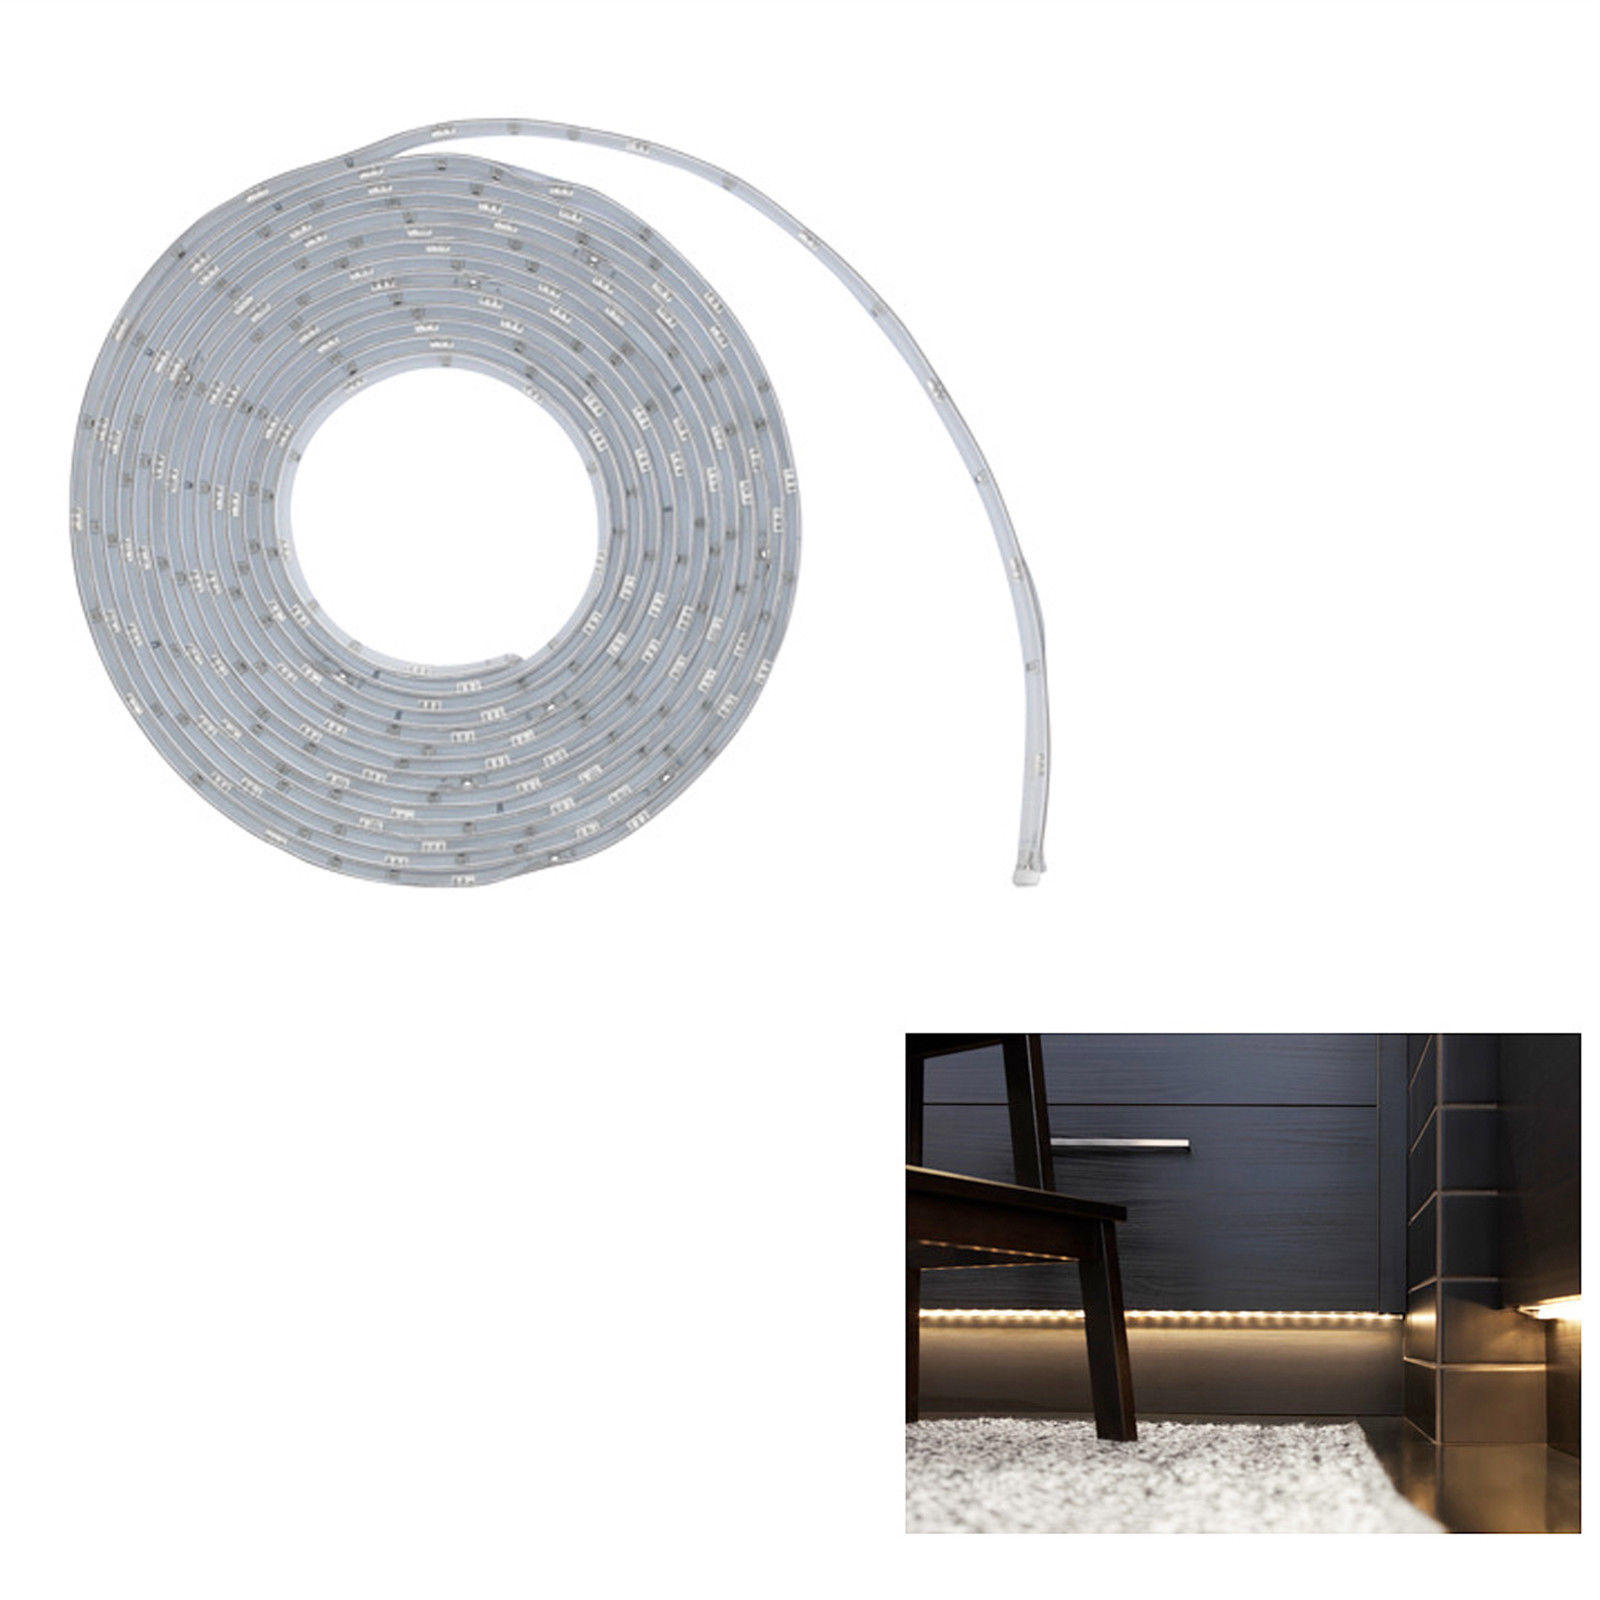 IKEA LEDBERG LED Flexible Lichtleiste 5 meter weiß Komplettset mit ...